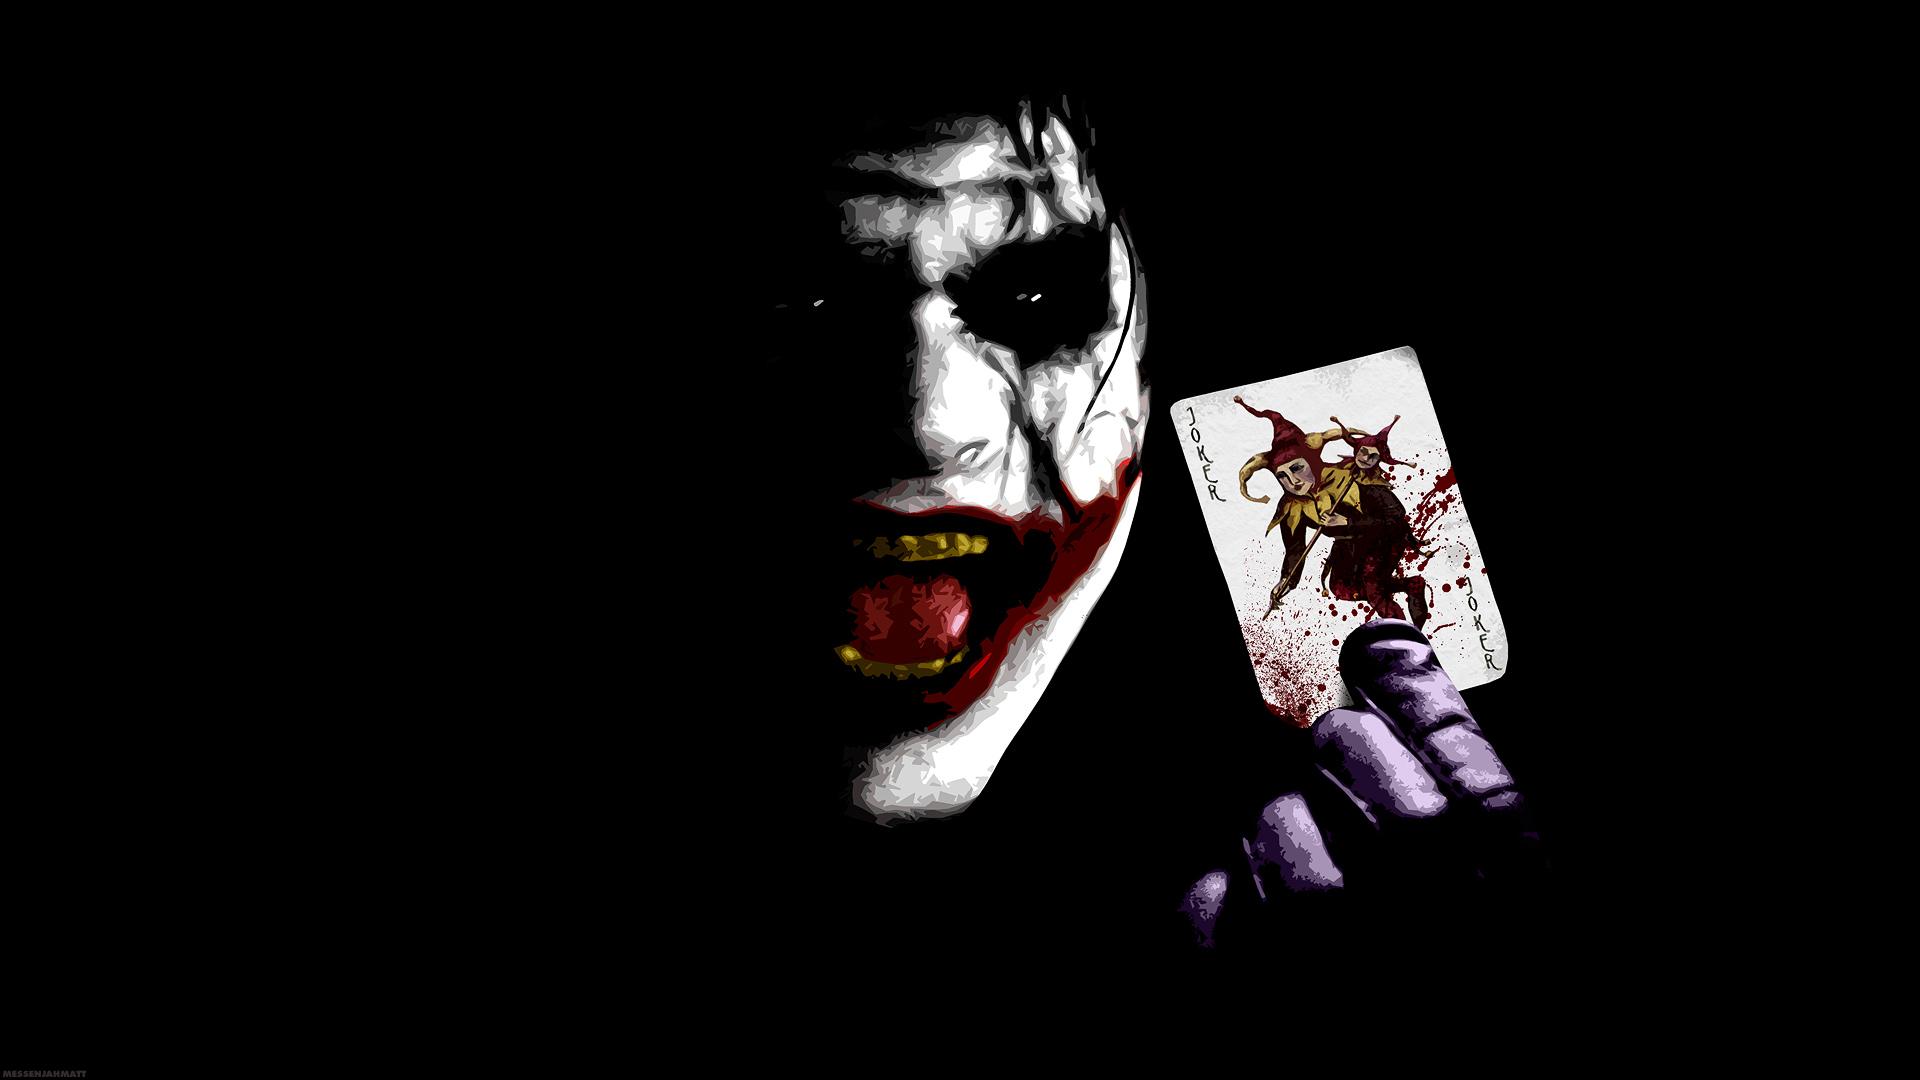 Joker Wallpaper Hd 175262 1920x1080